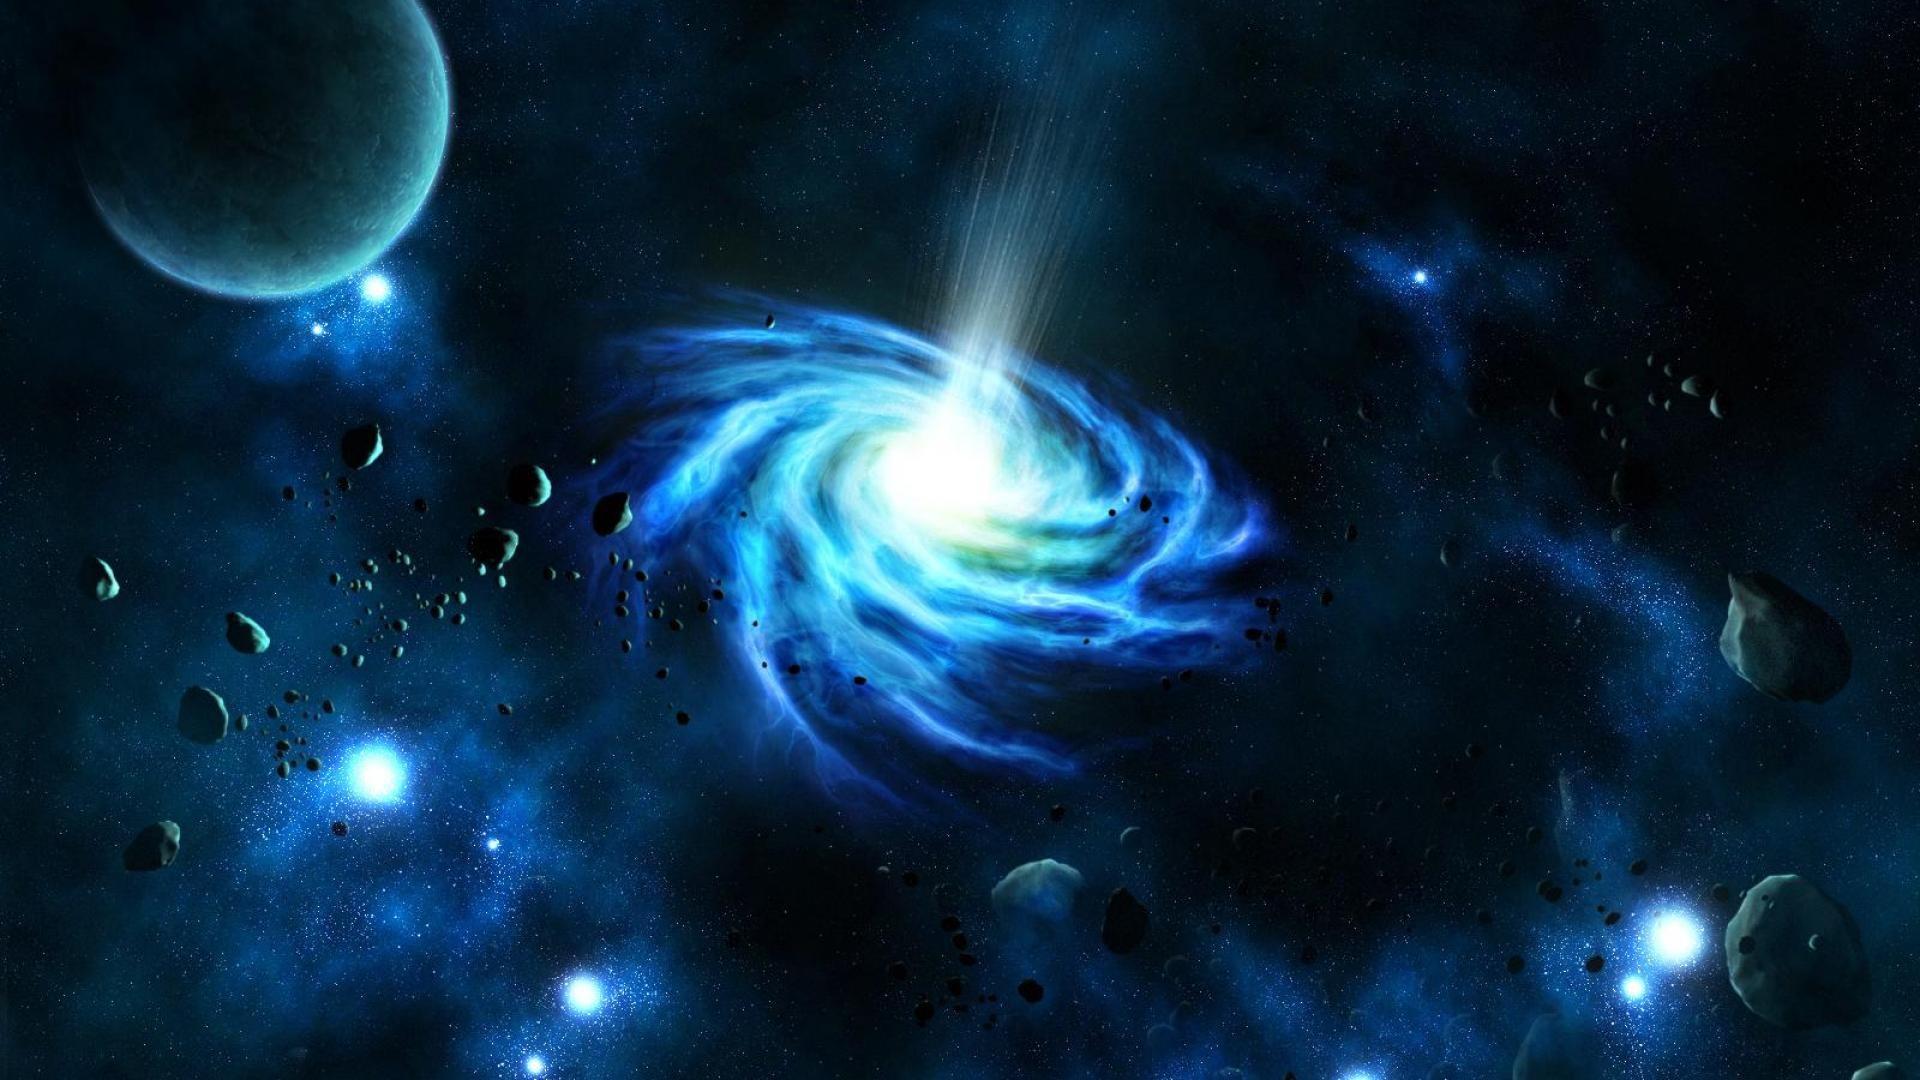 Interstellar Black Hole Wallpaper High Resolution